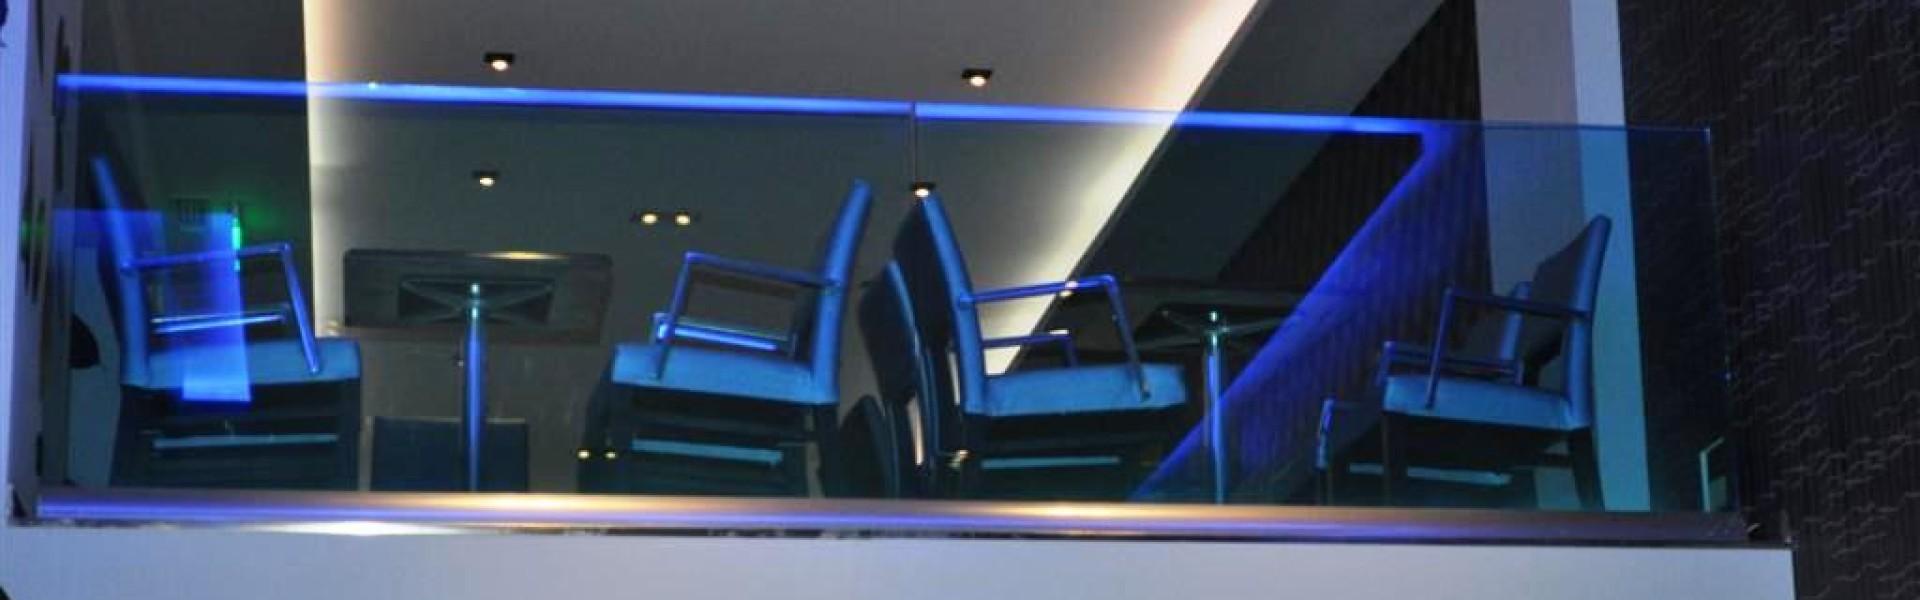 M3Italy: finestre scorrevoli